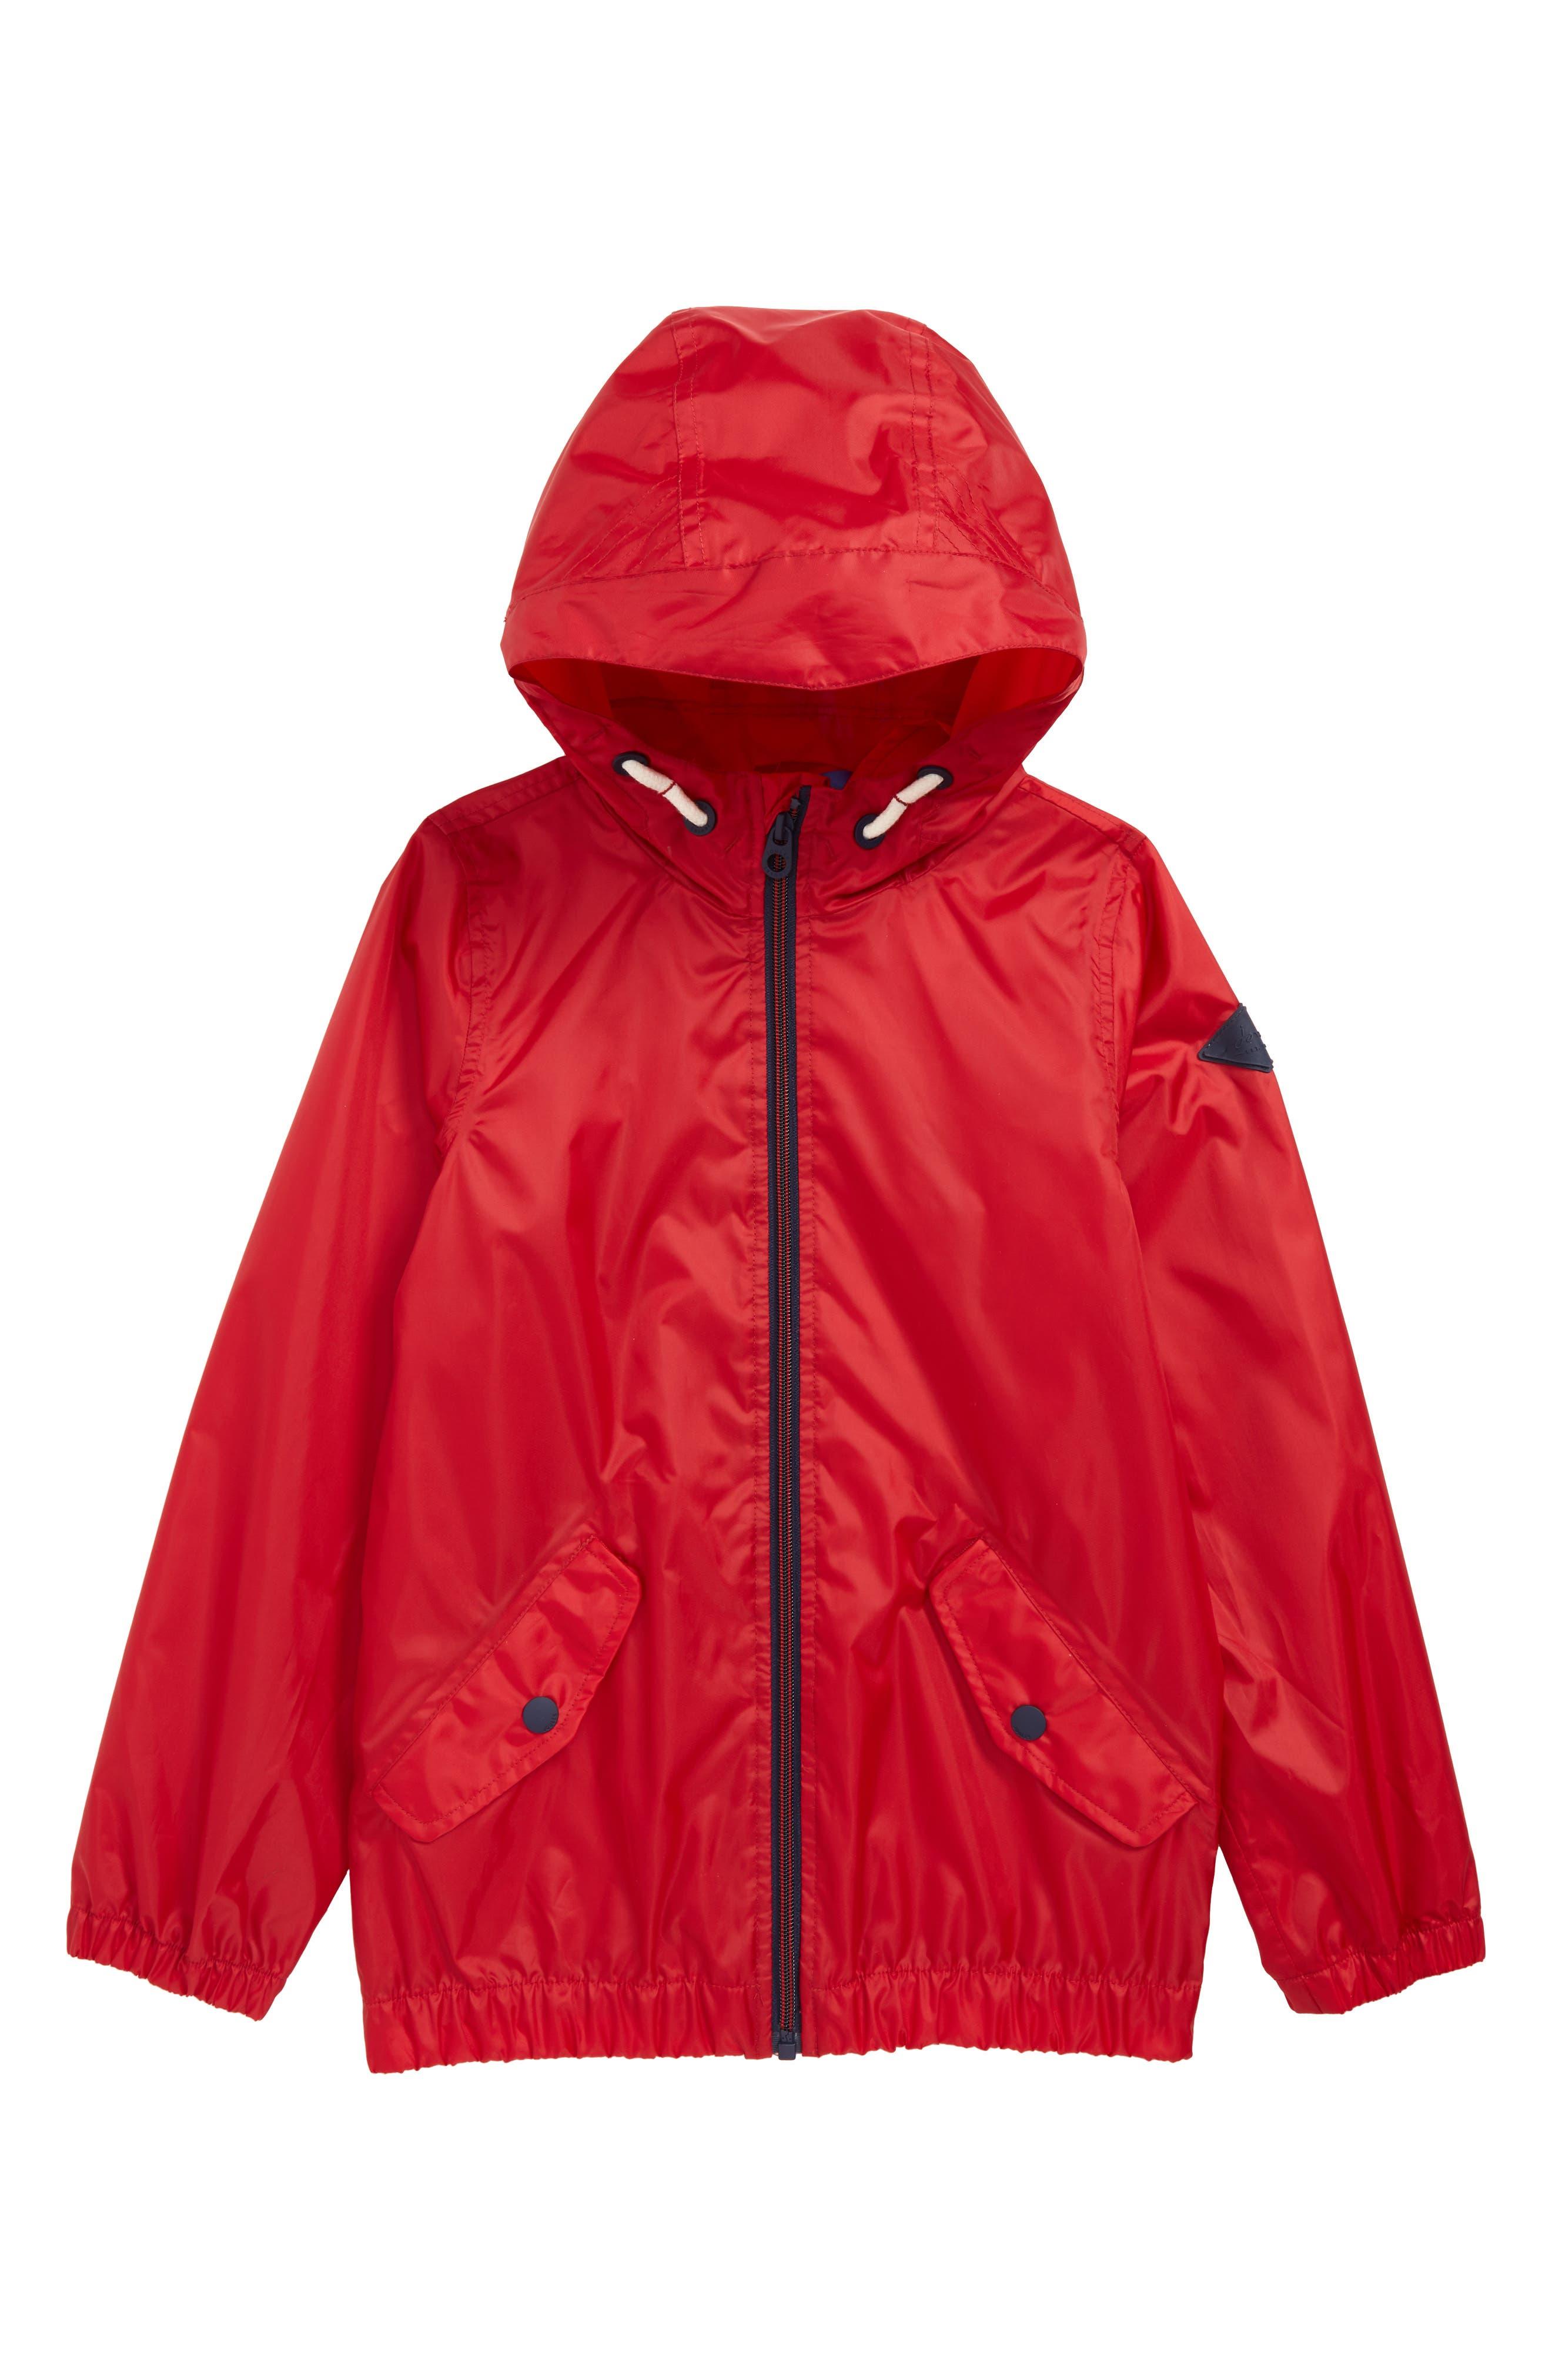 Boys Joules Rowan Lightweight Raincoat Size 6Y  Red